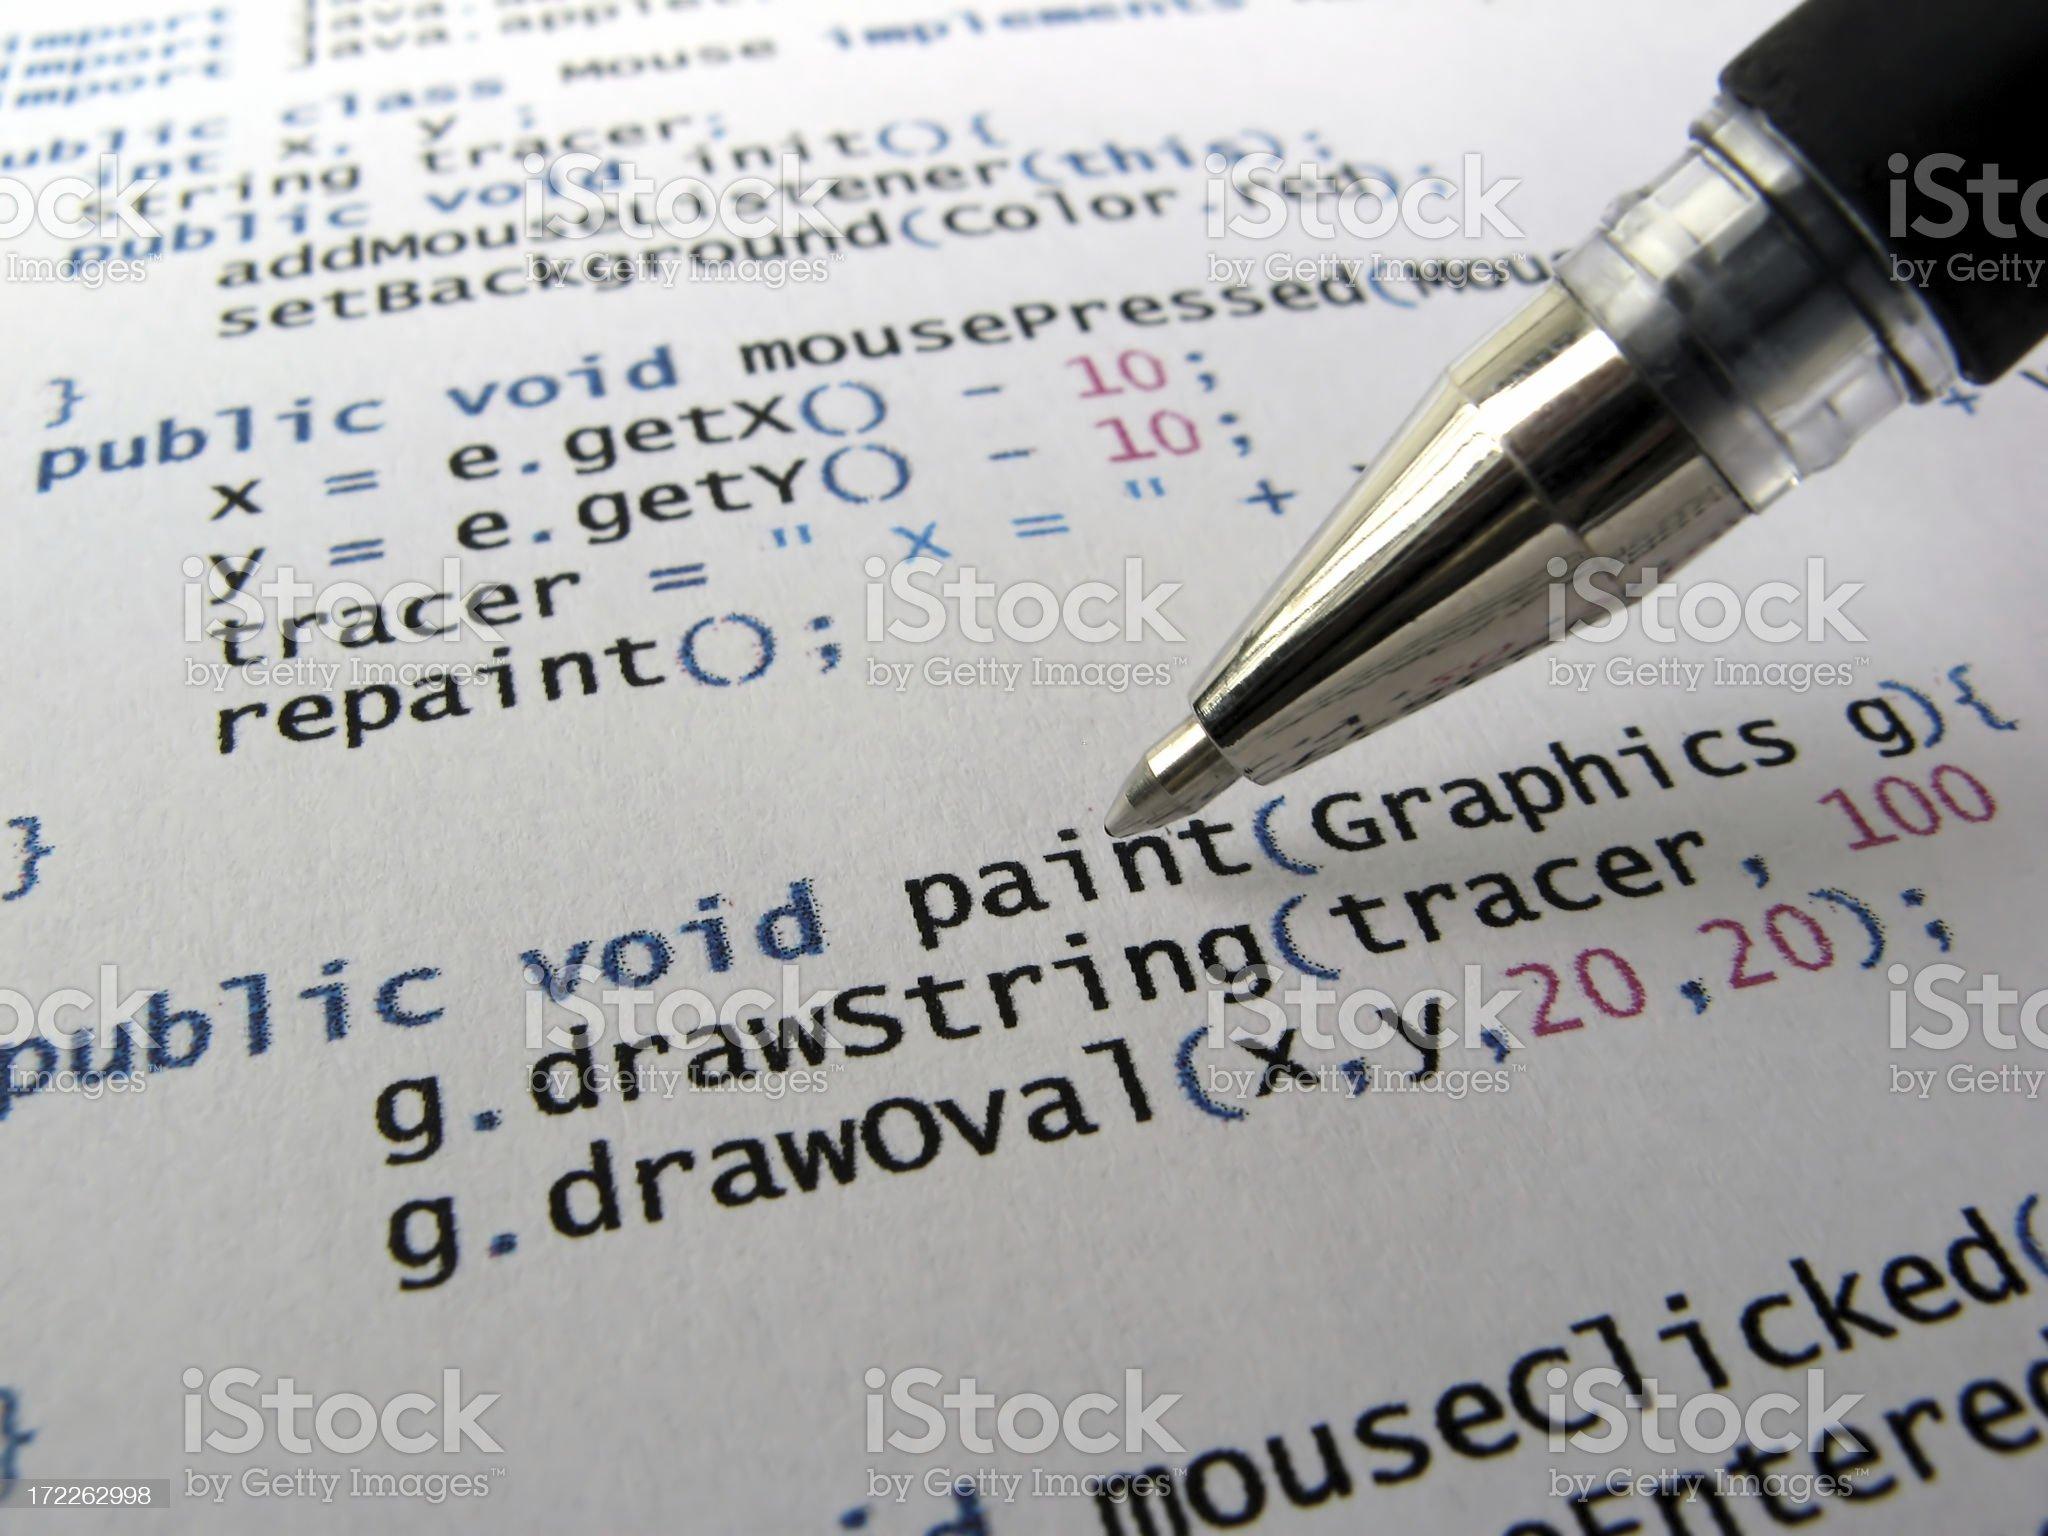 Computer code royalty-free stock photo